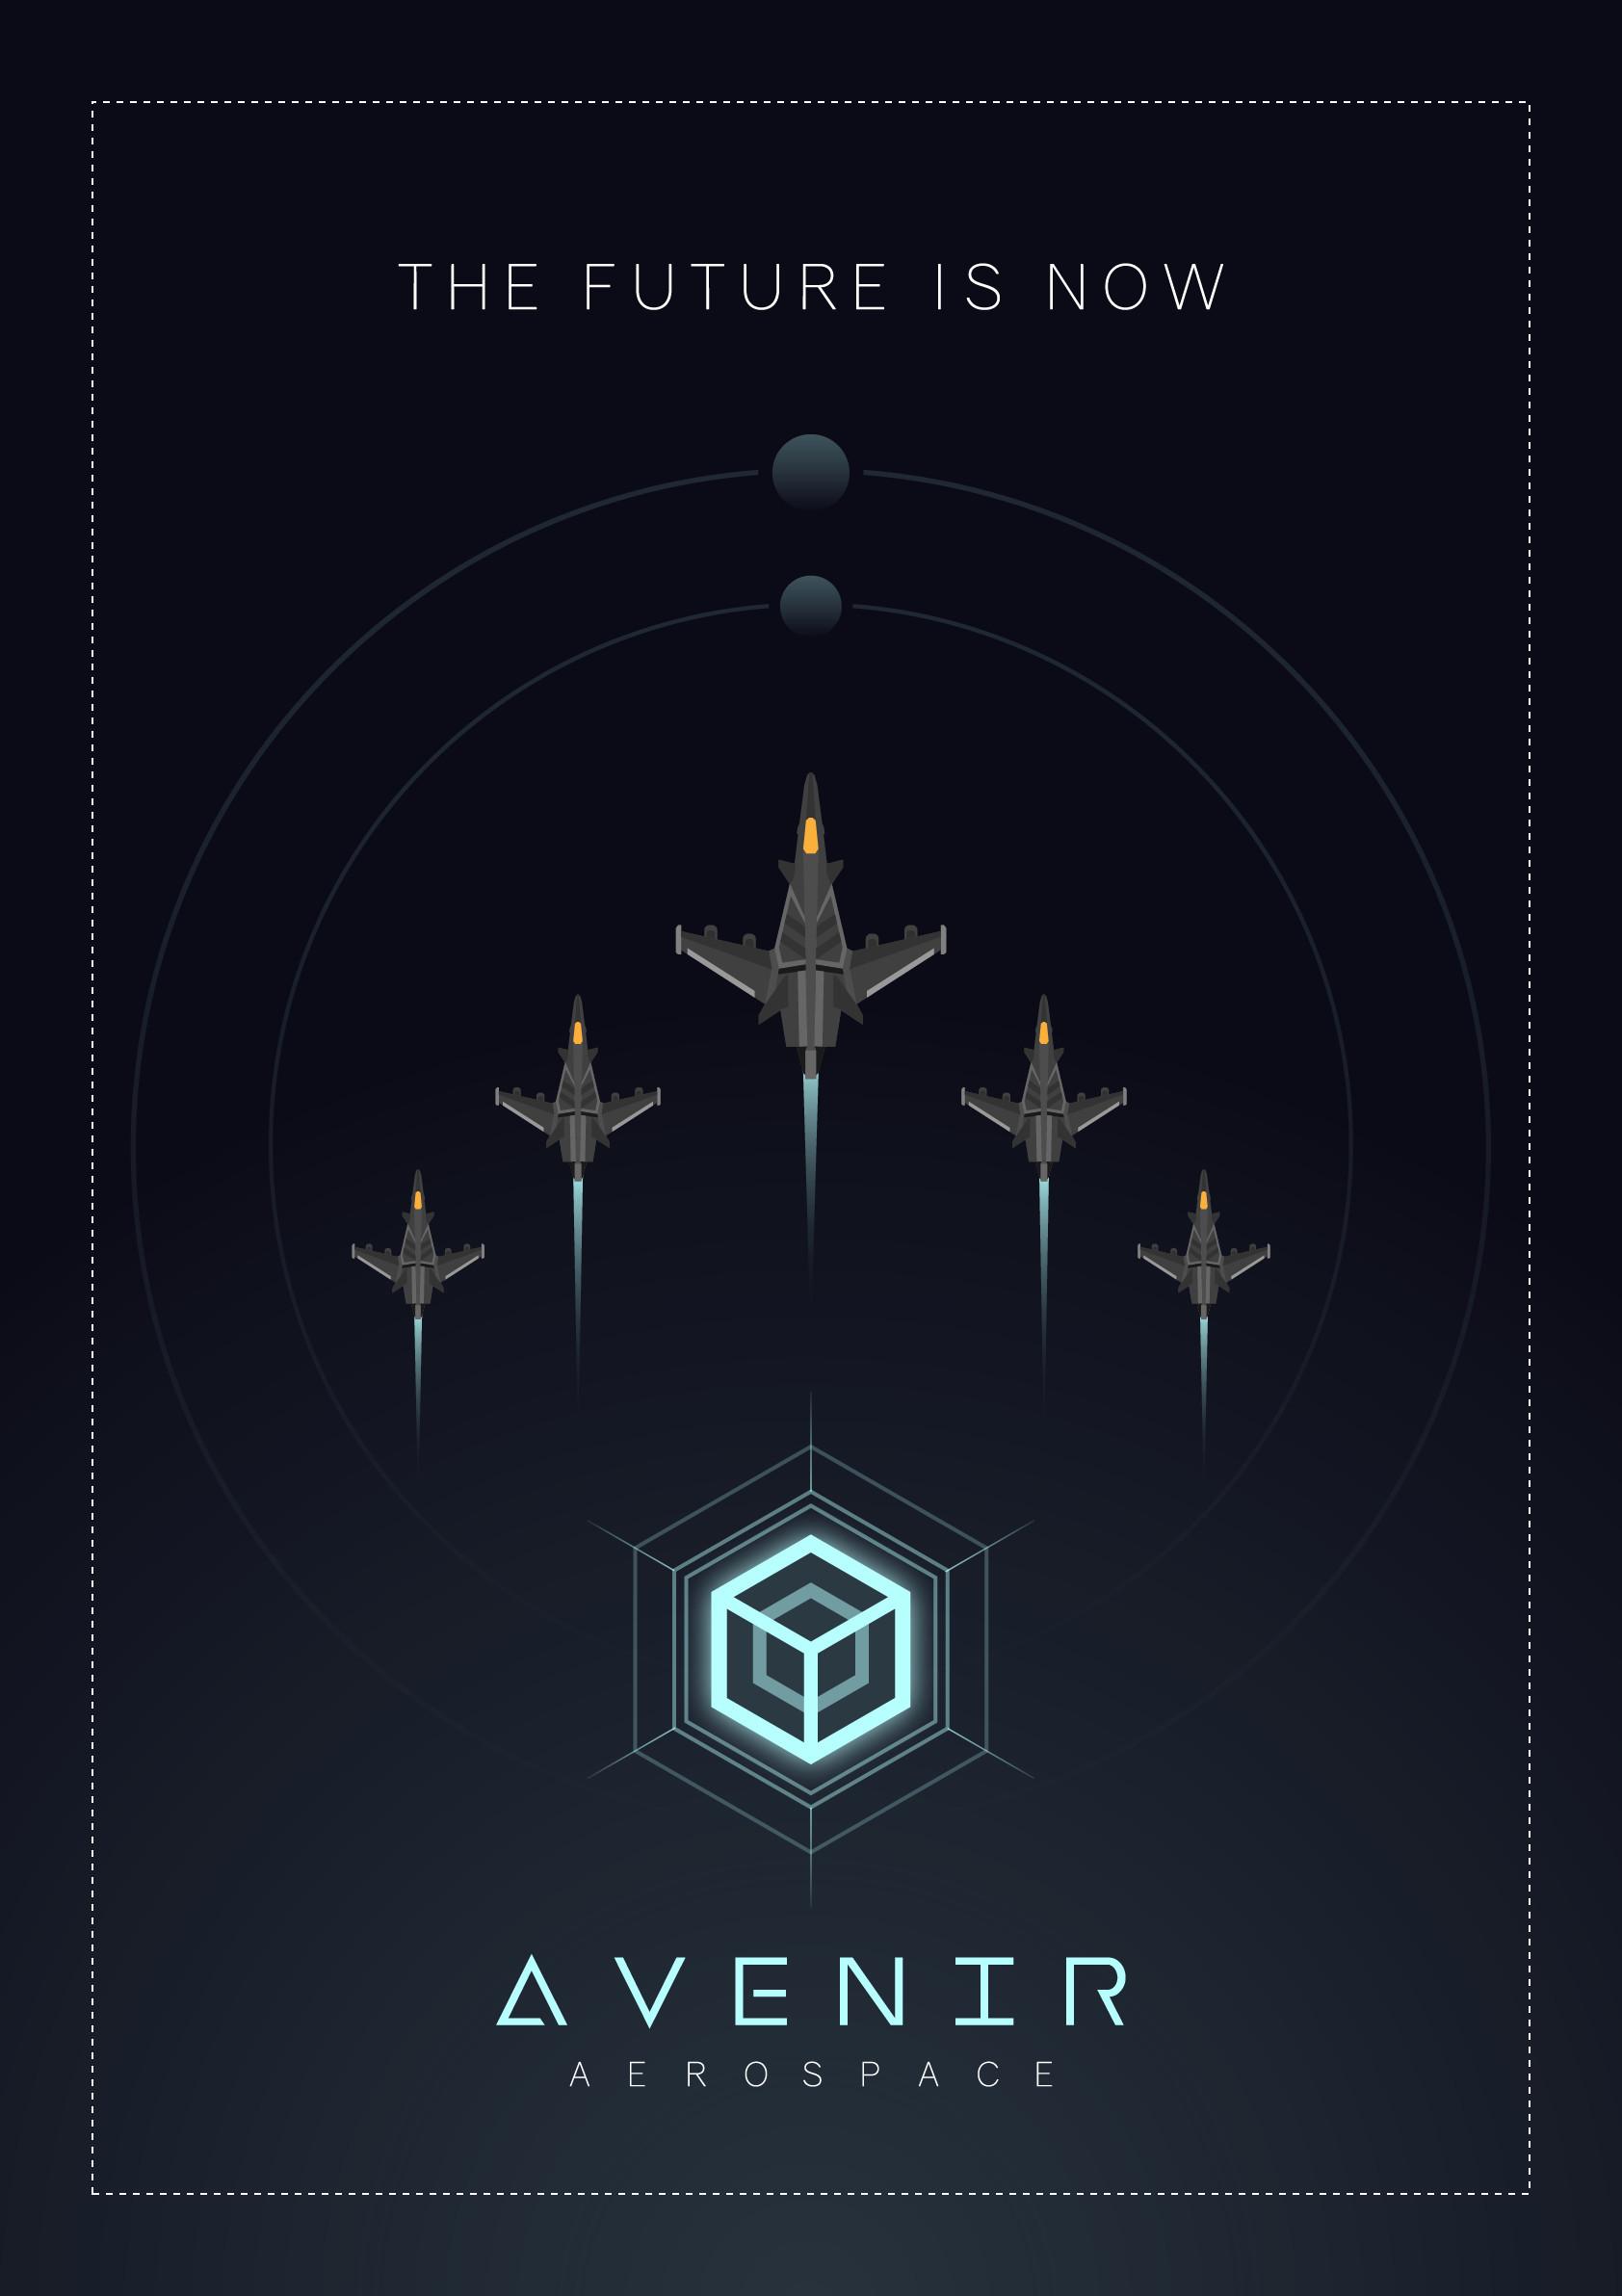 Avenir Aerospace poster